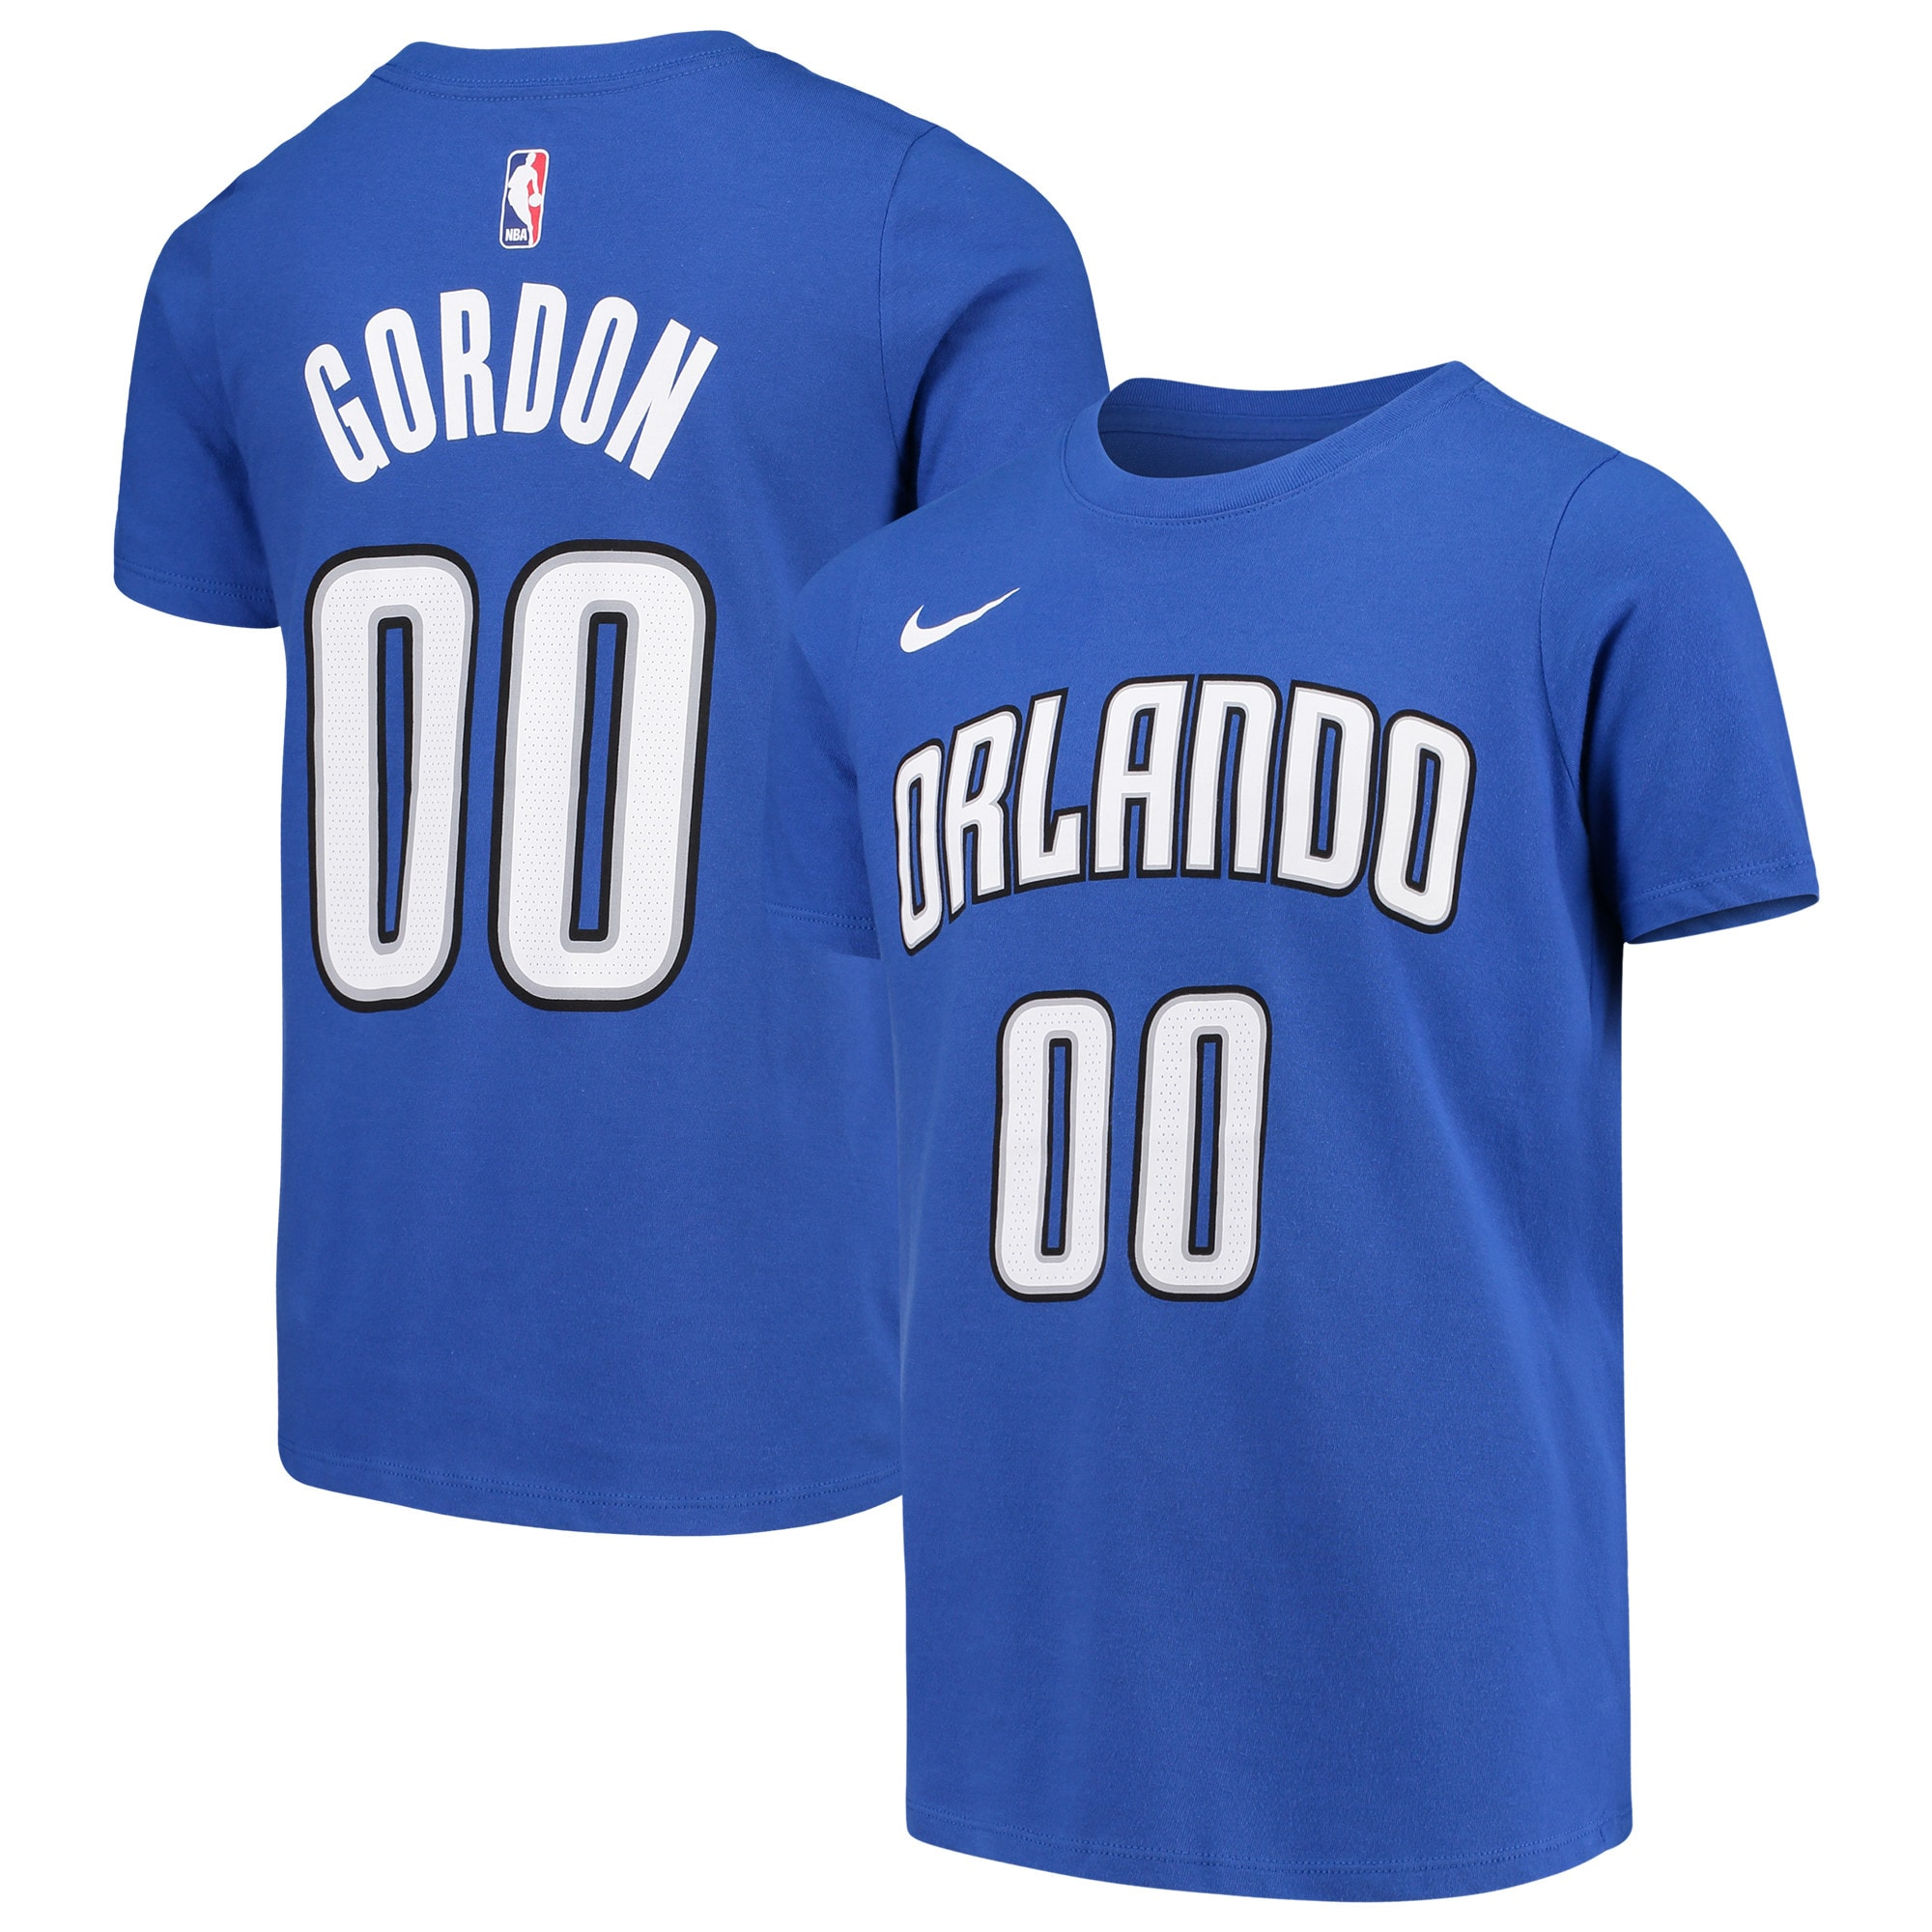 Aaron Gordon Orlando Magic Nike Youth Name & Number Performance T-Shirt - Blue